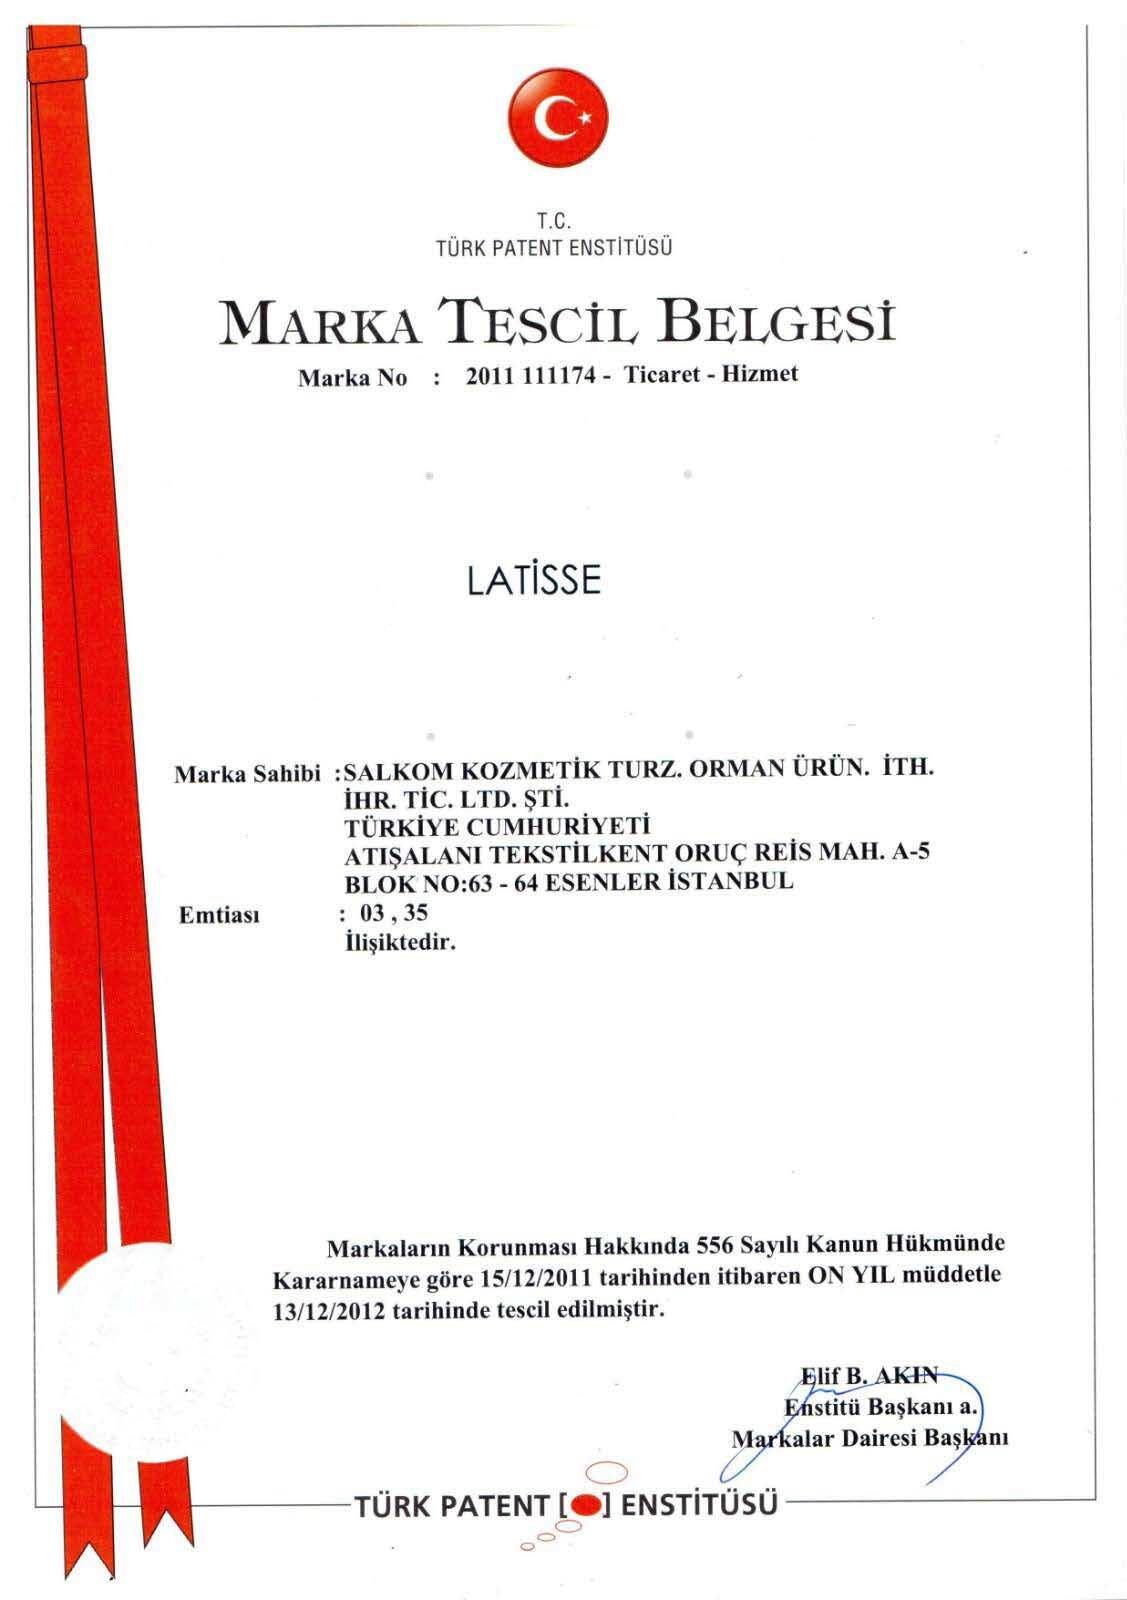 Latisse Marka Tescili